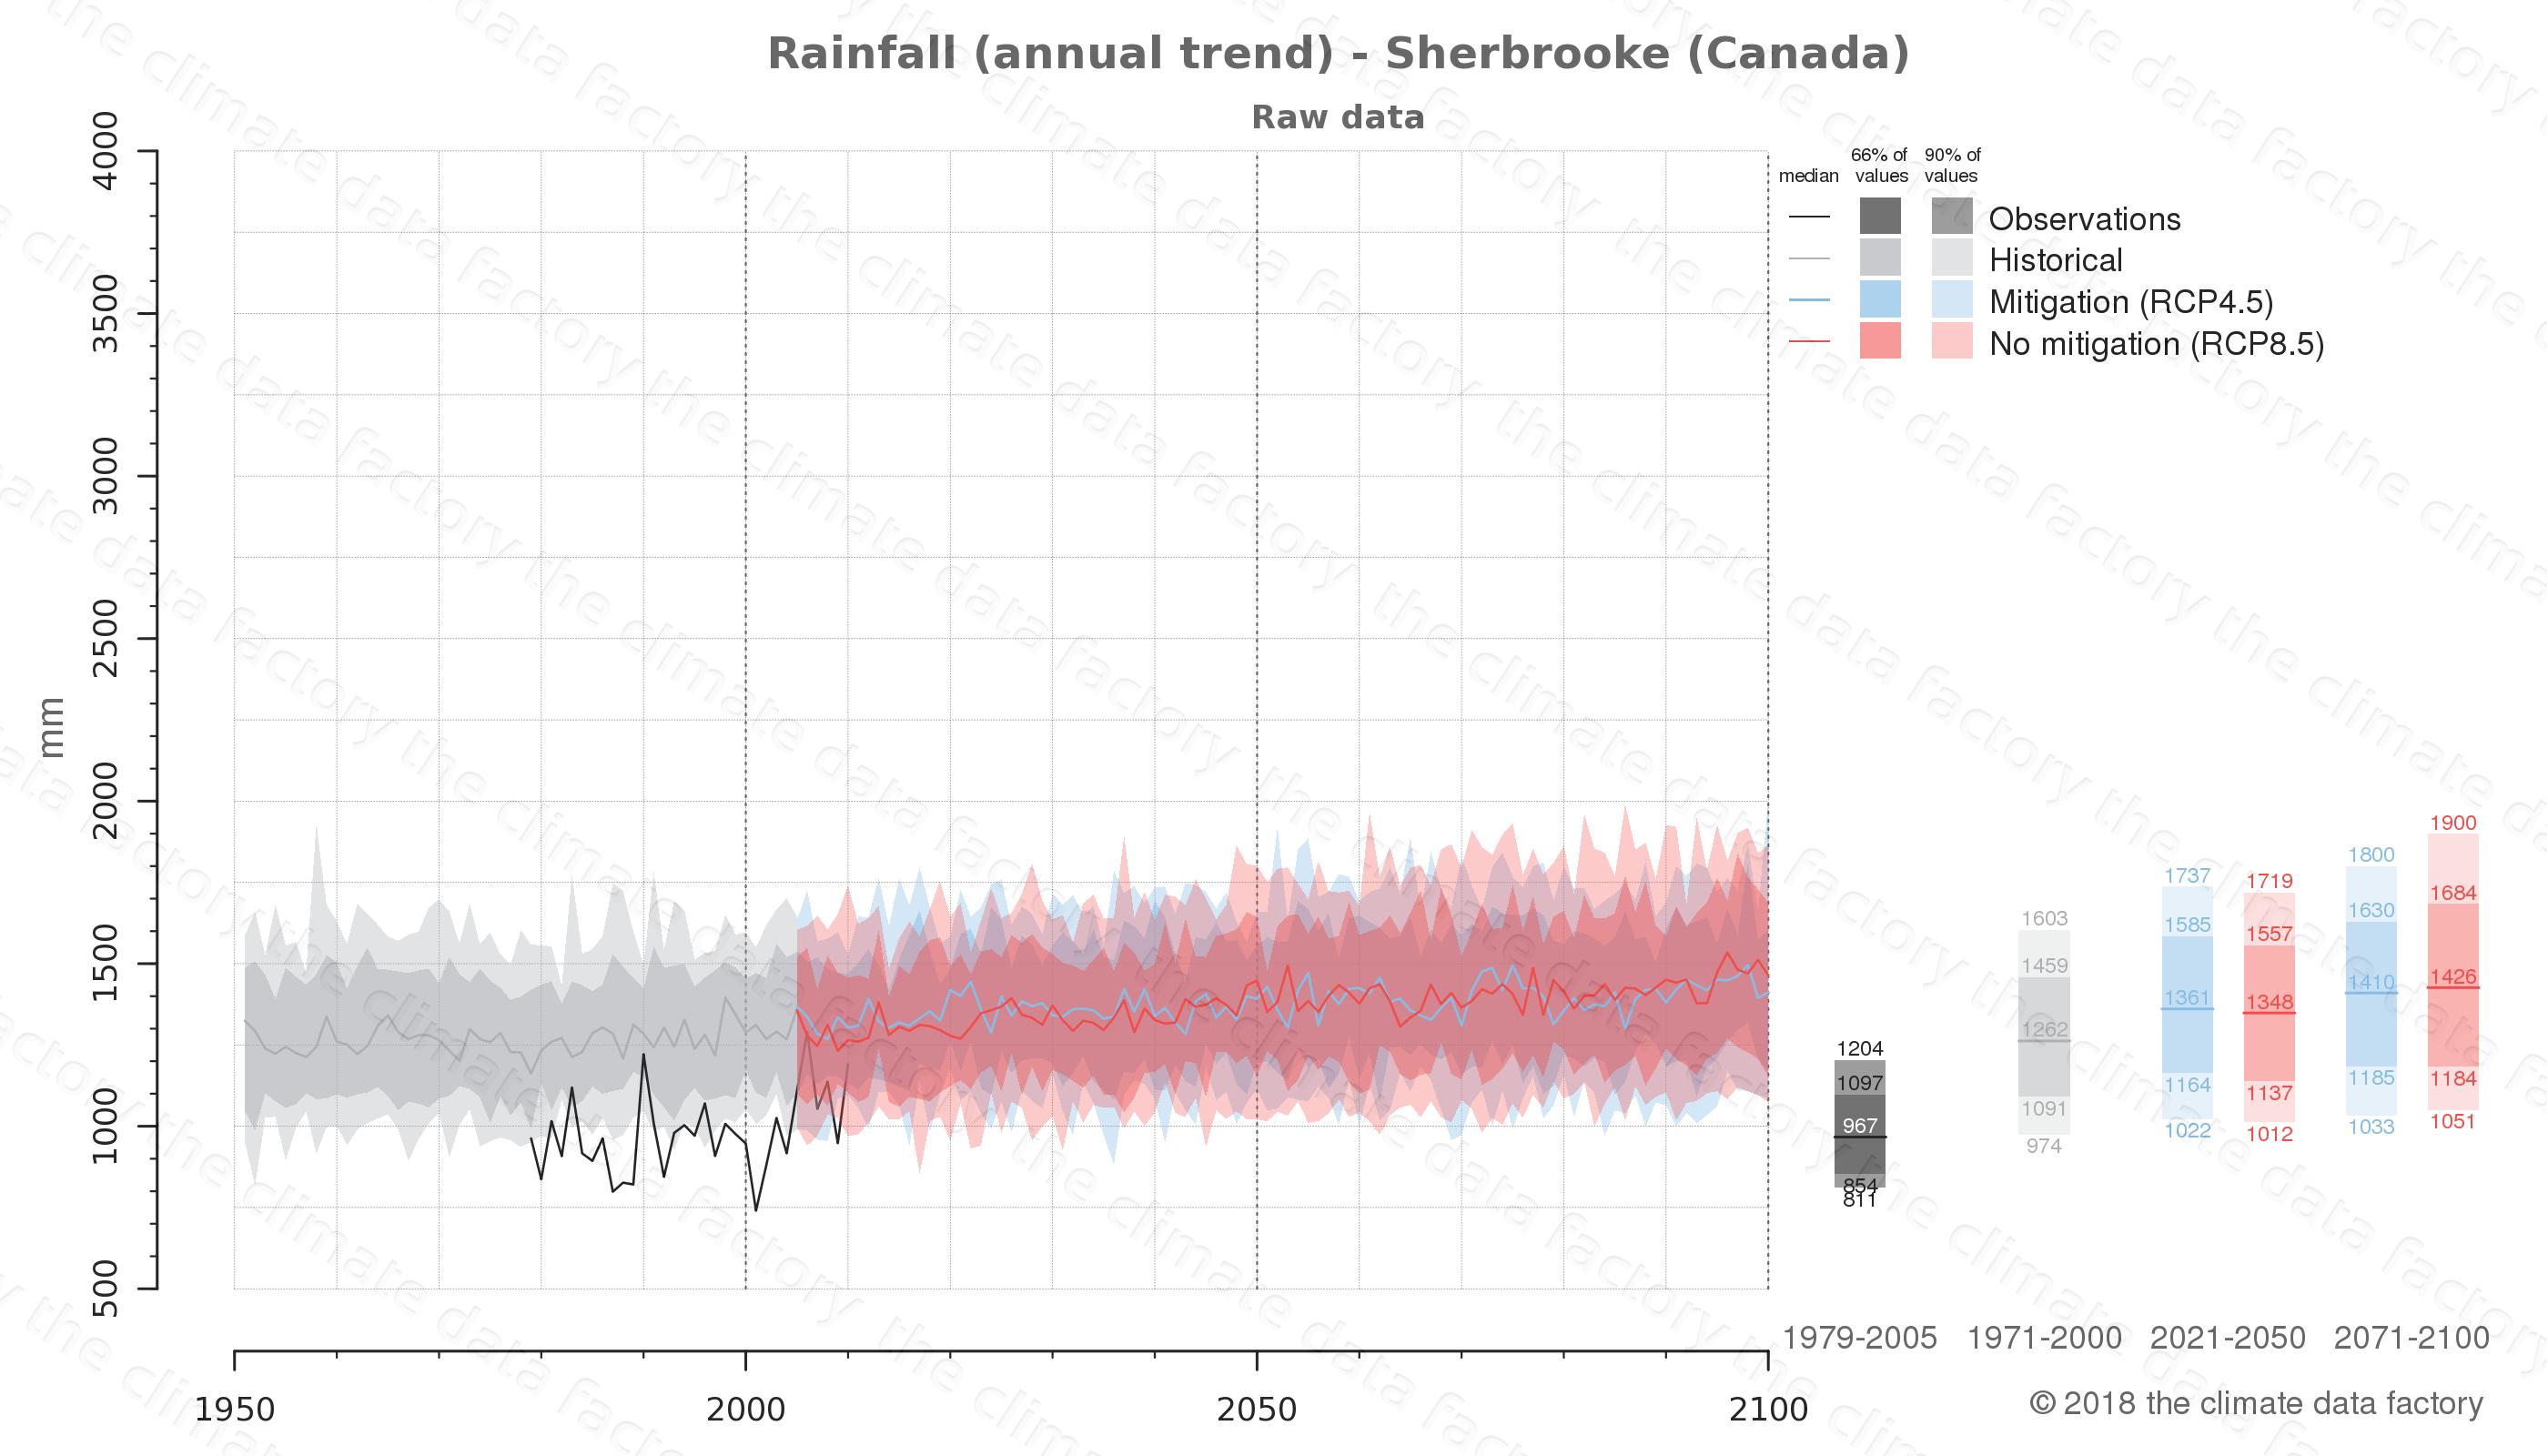 climate change data policy adaptation climate graph city data rainfall sherbrooke canada